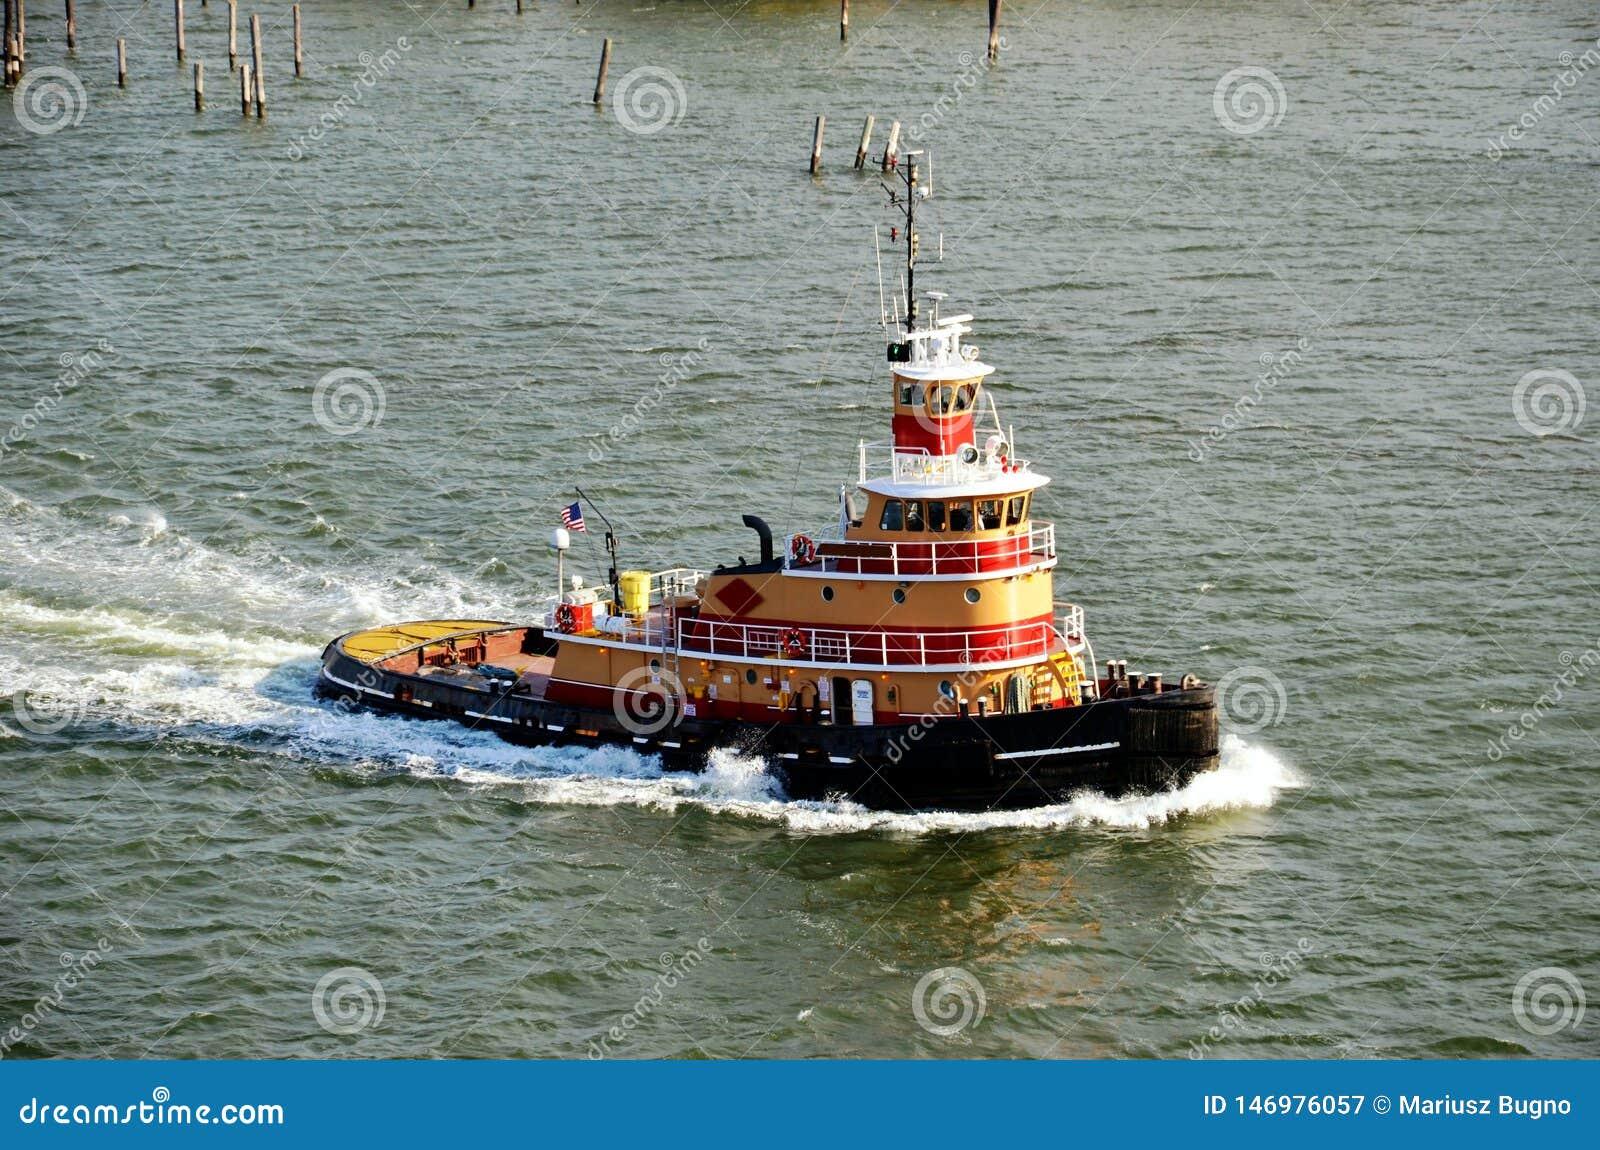 Tugboat που πλέει για να βοηθήσει με την προσόρμιση του σκάφους φορτίου, κόλπος της Νέας Υόρκης